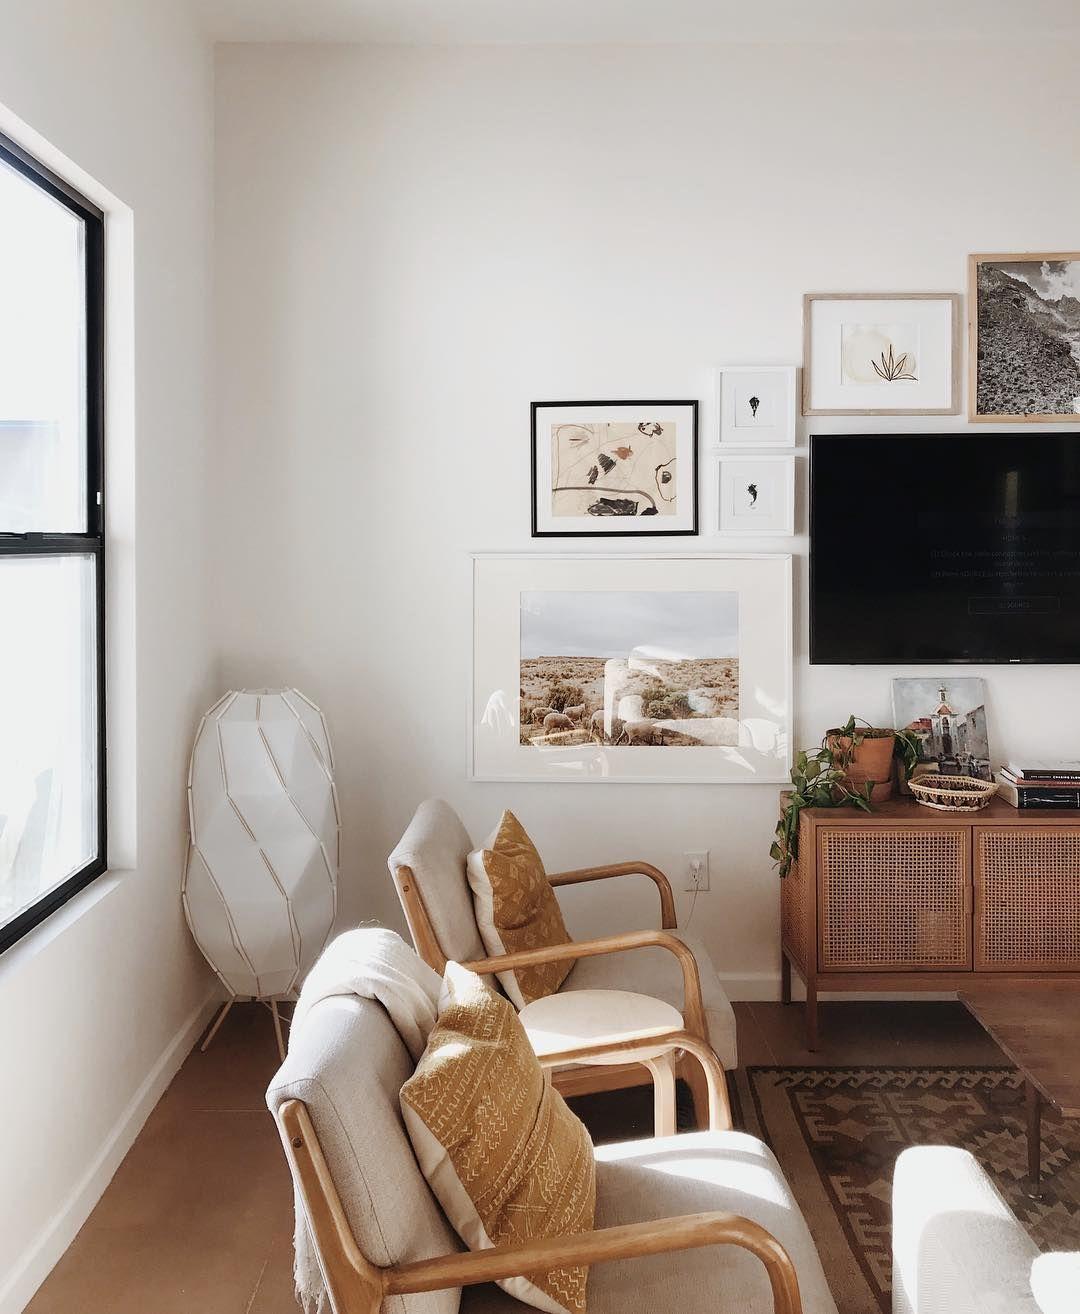 Light Airy With Warm Wood Tones Cozy Living Room Corner